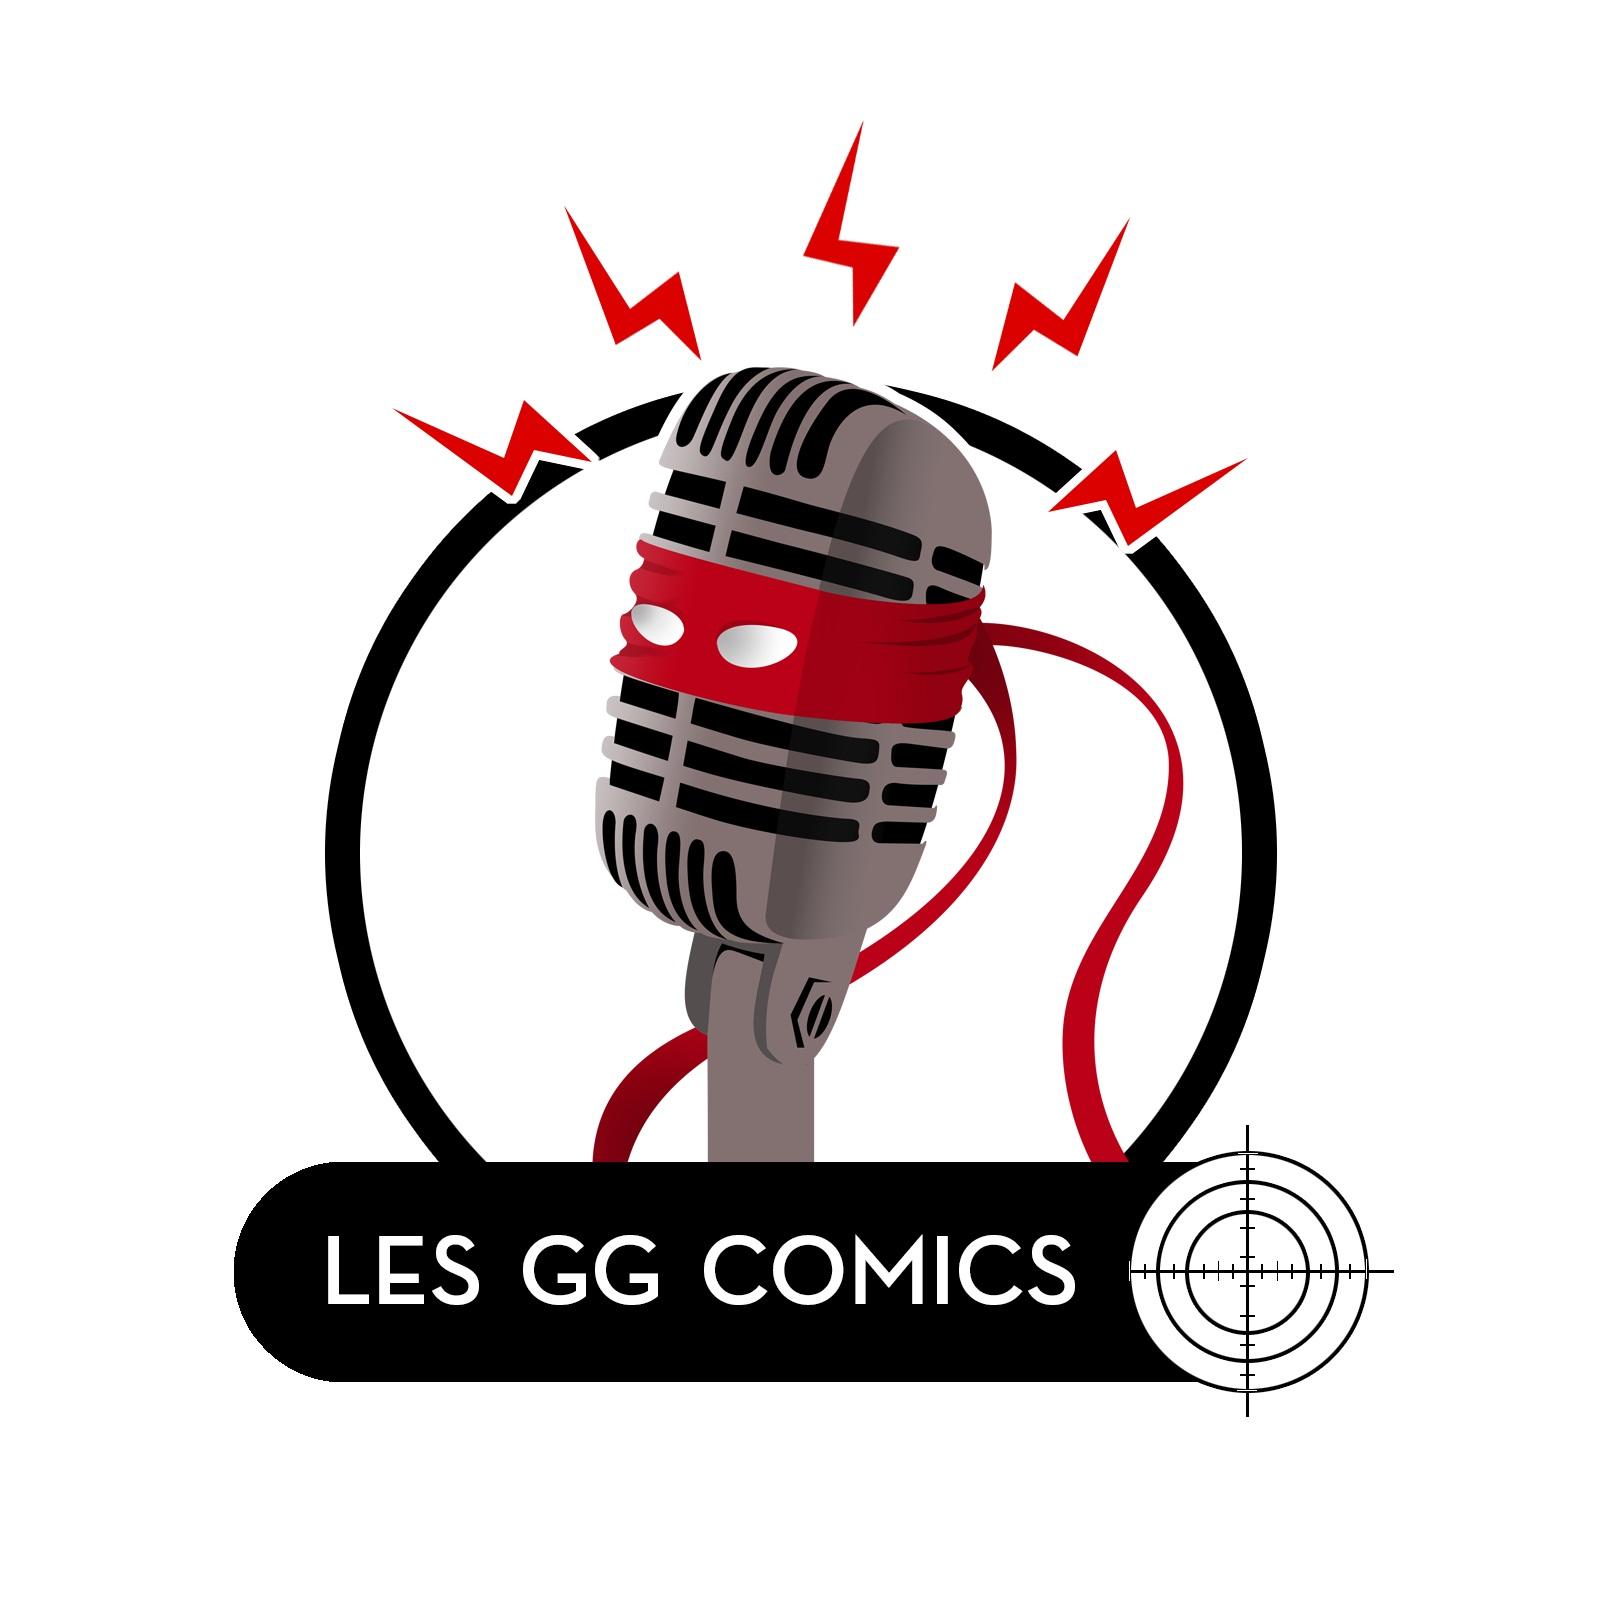 Les GG comics #055 : la modernité a-t-elle perverti Harley Quinn ?